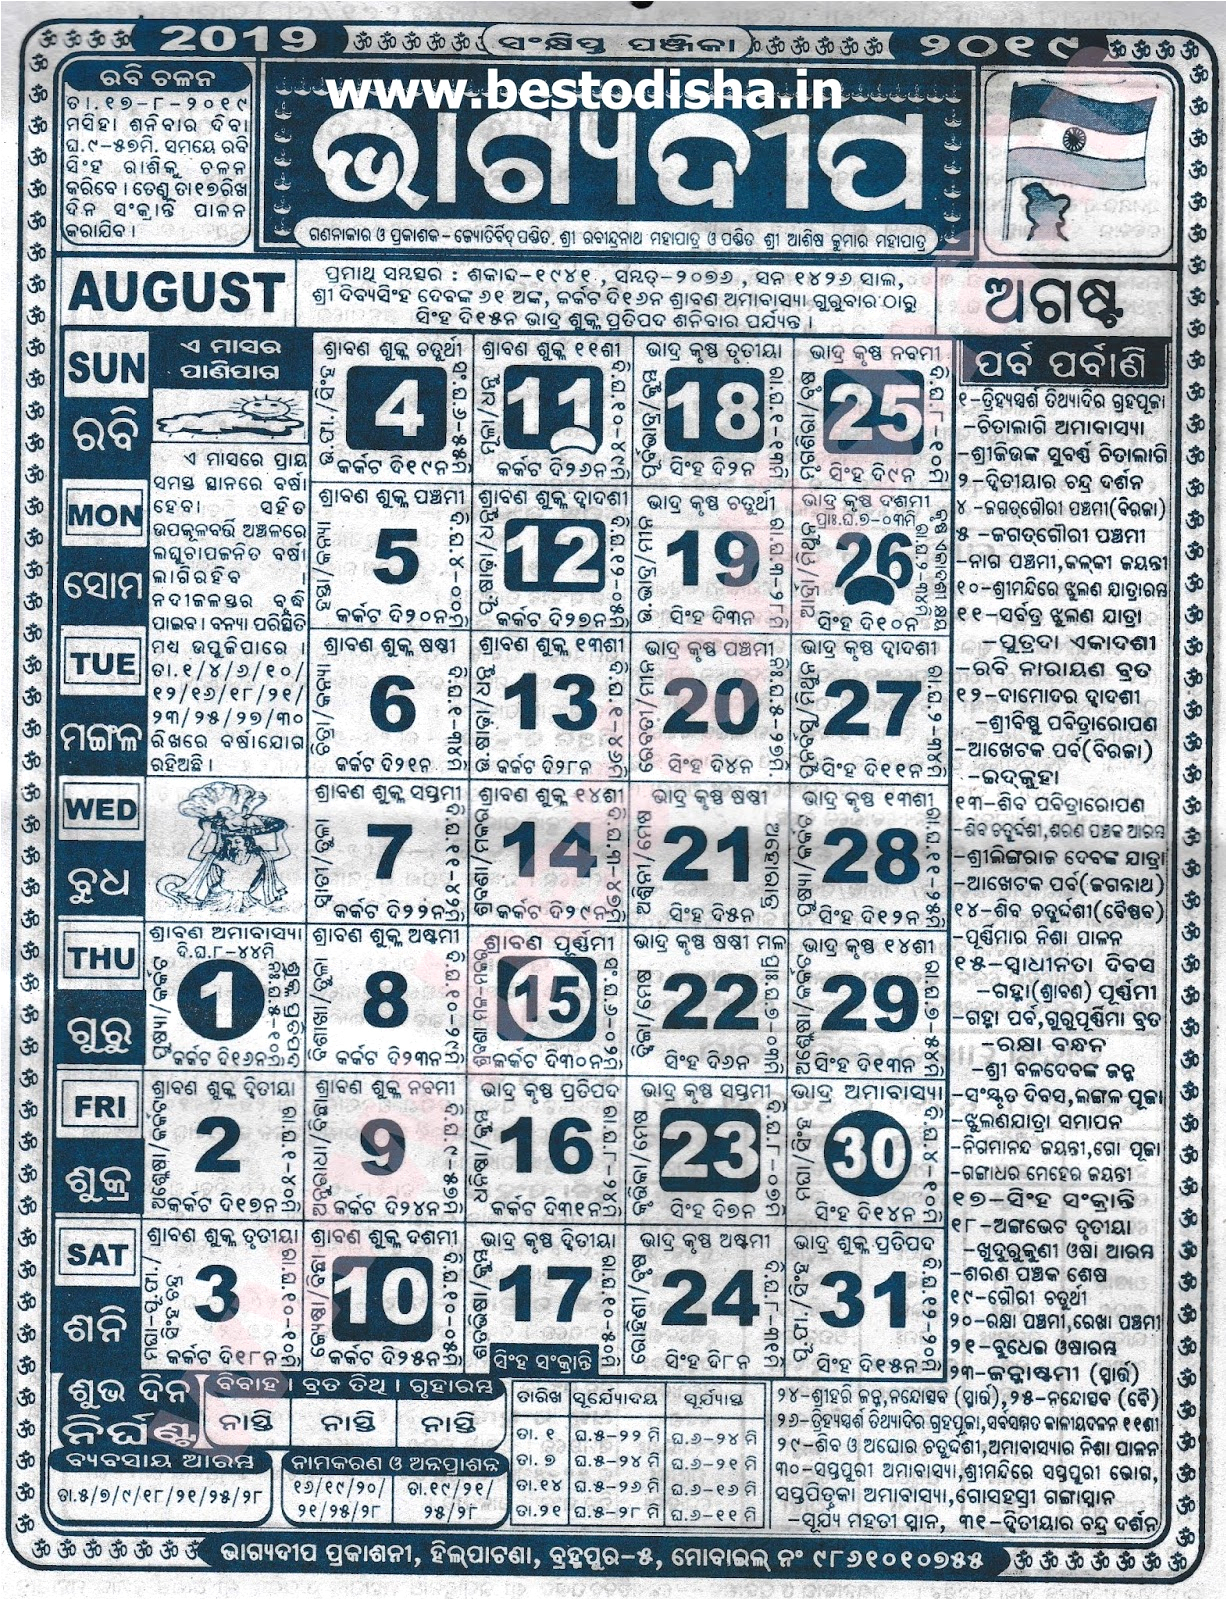 Excellent 49 Illustration 2019 Calendar Odia Calendar for Odia Calendar Bhagyadeep